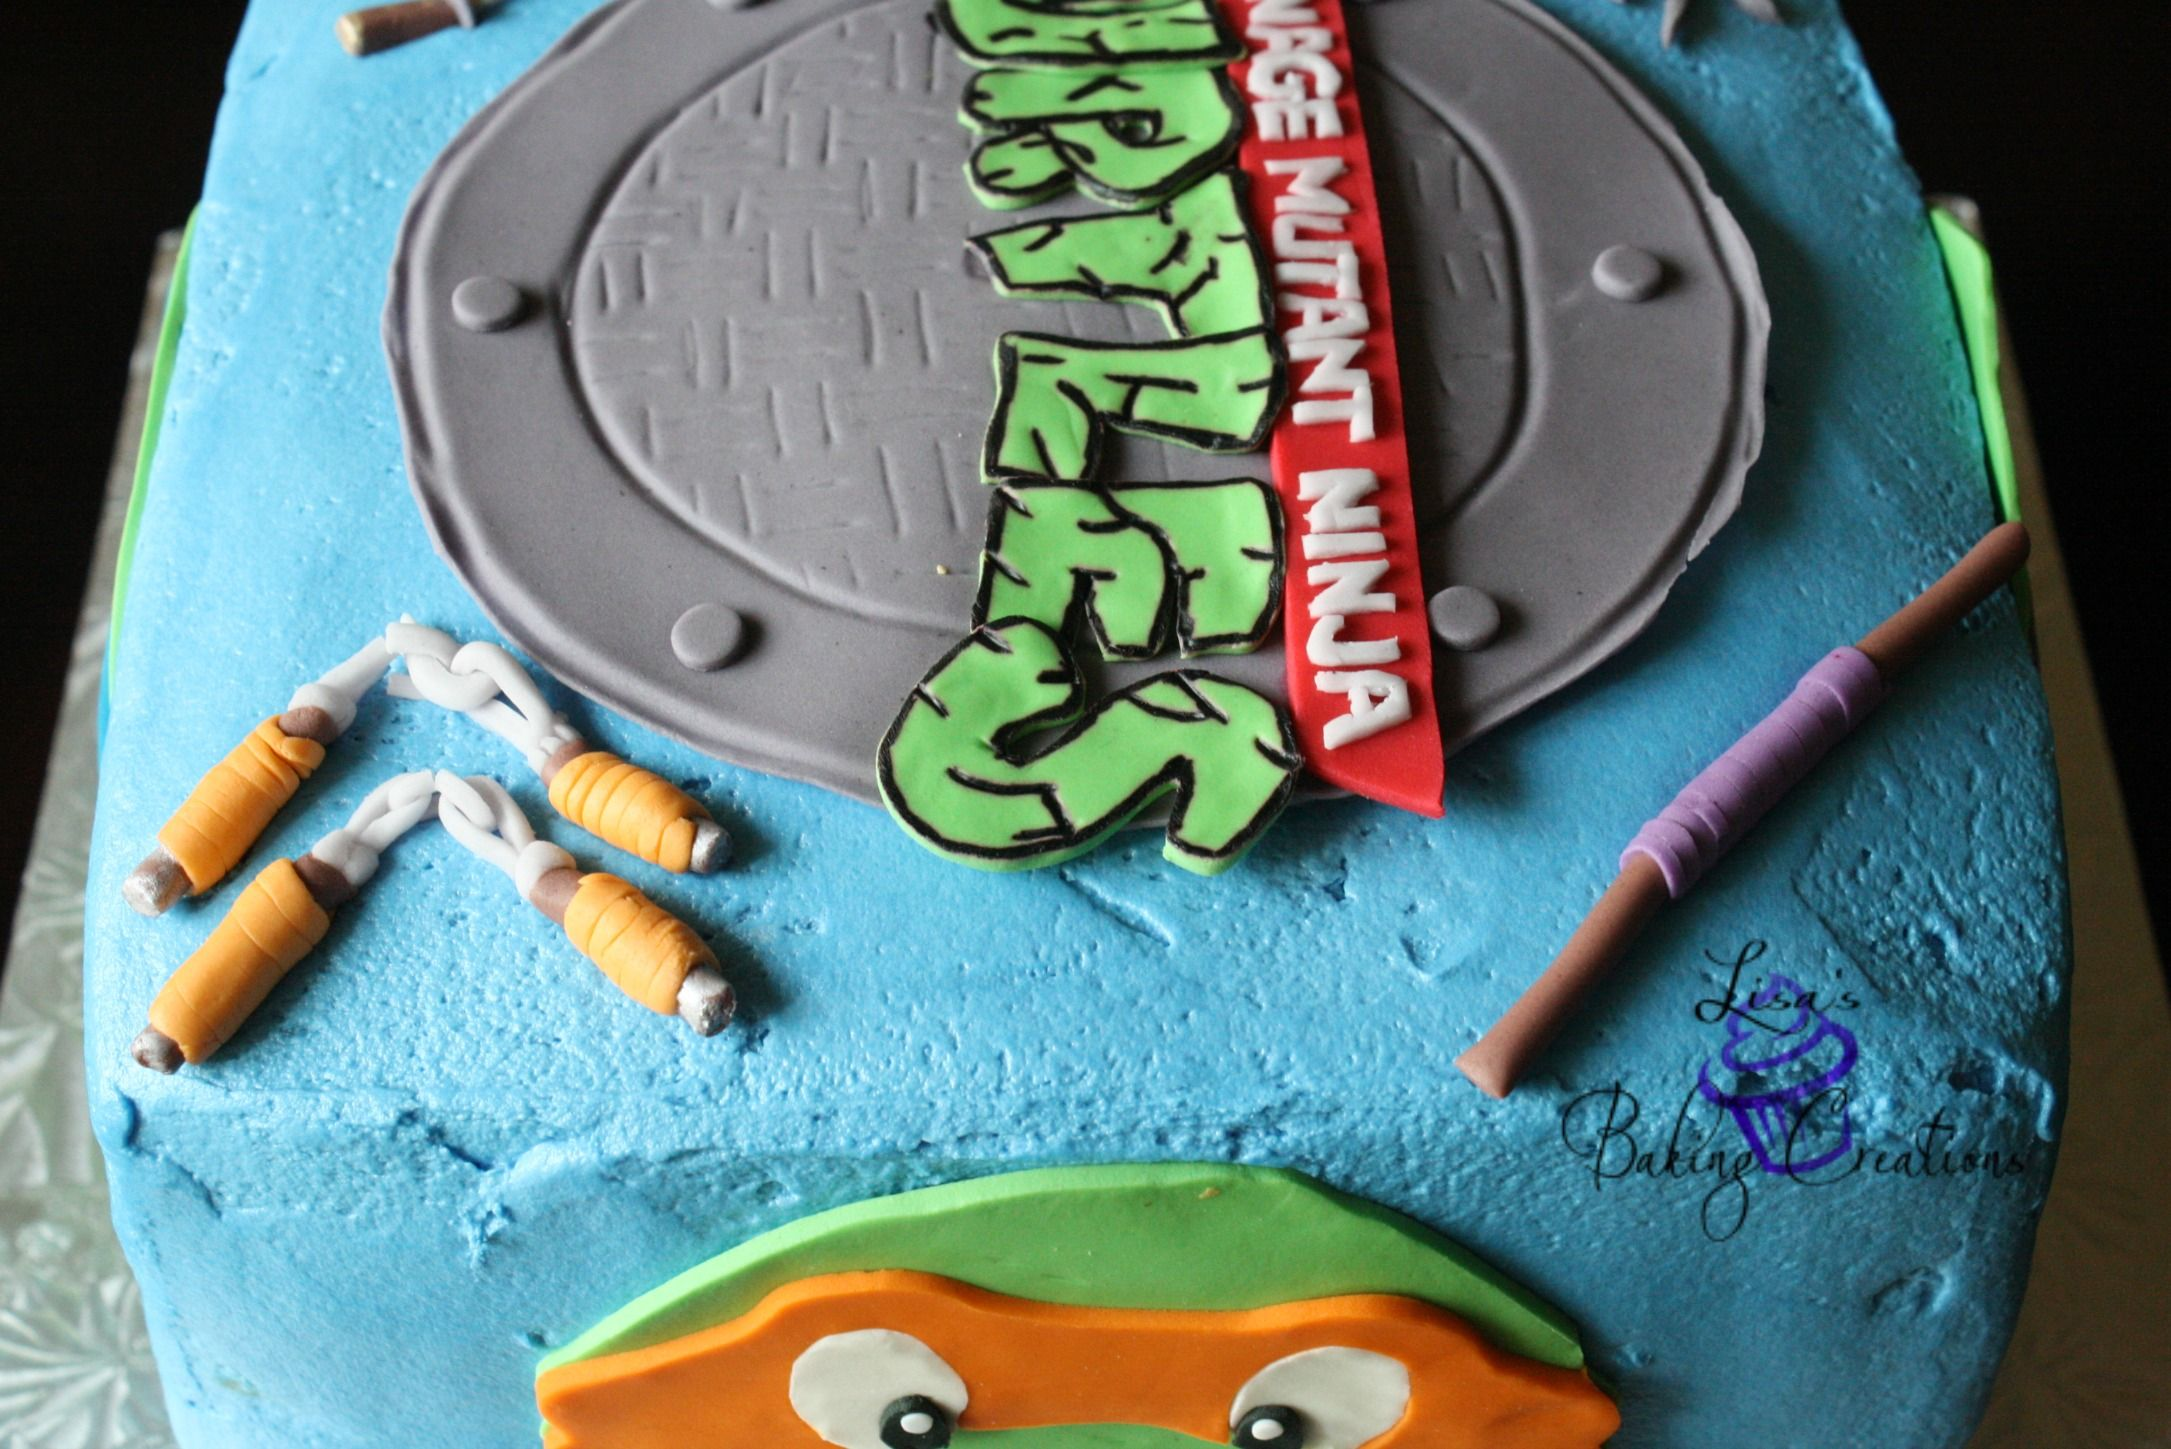 Ninja Turtle Weapons